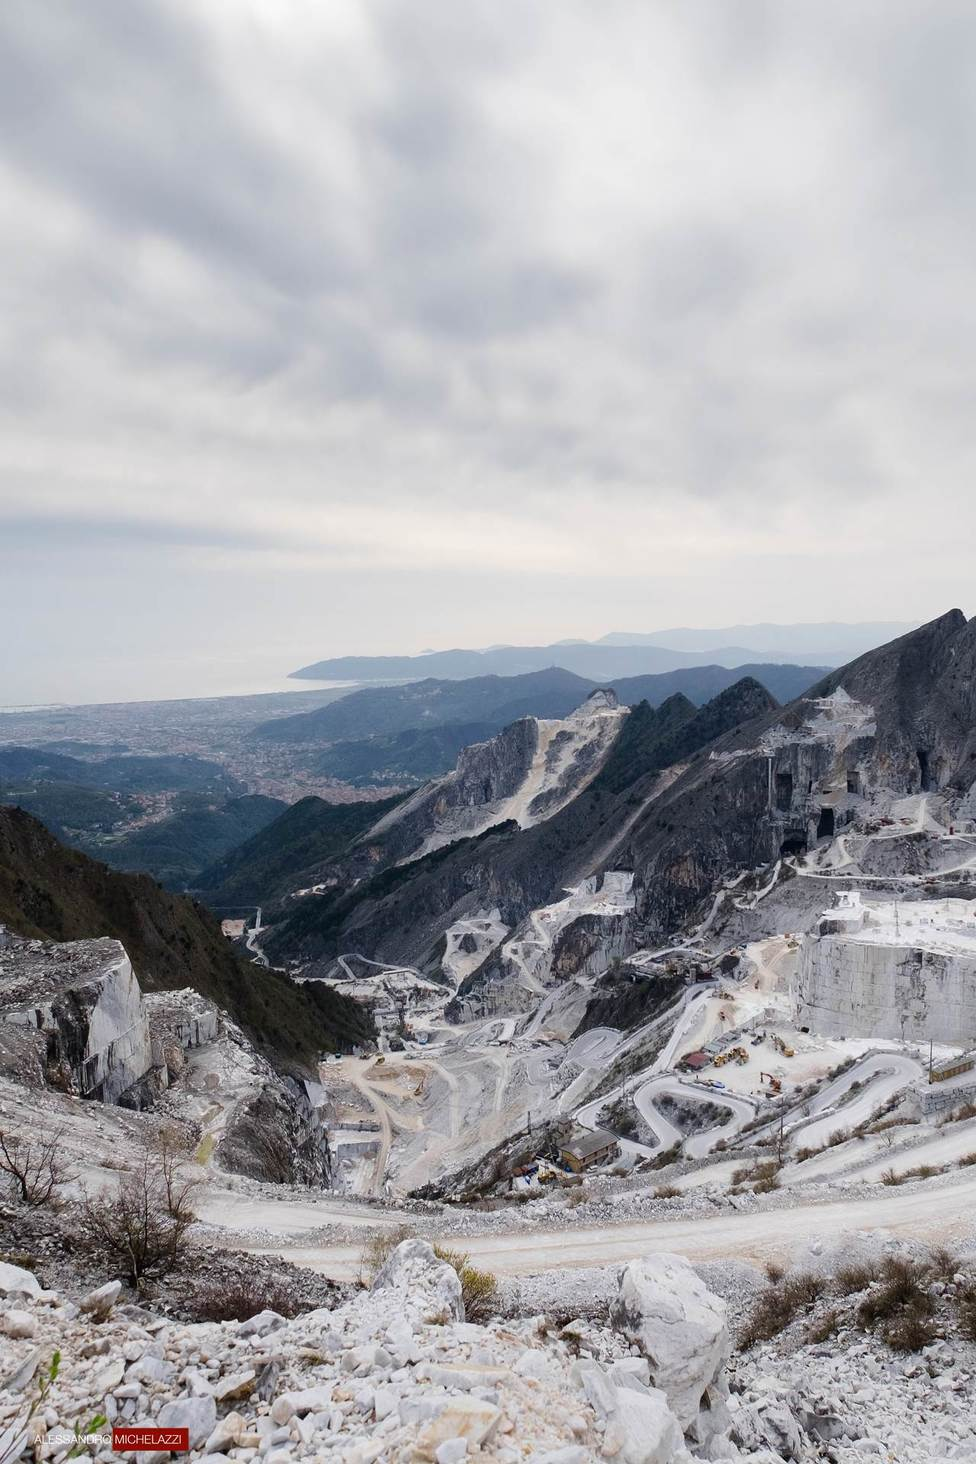 carrara-marble-cave-photos-14